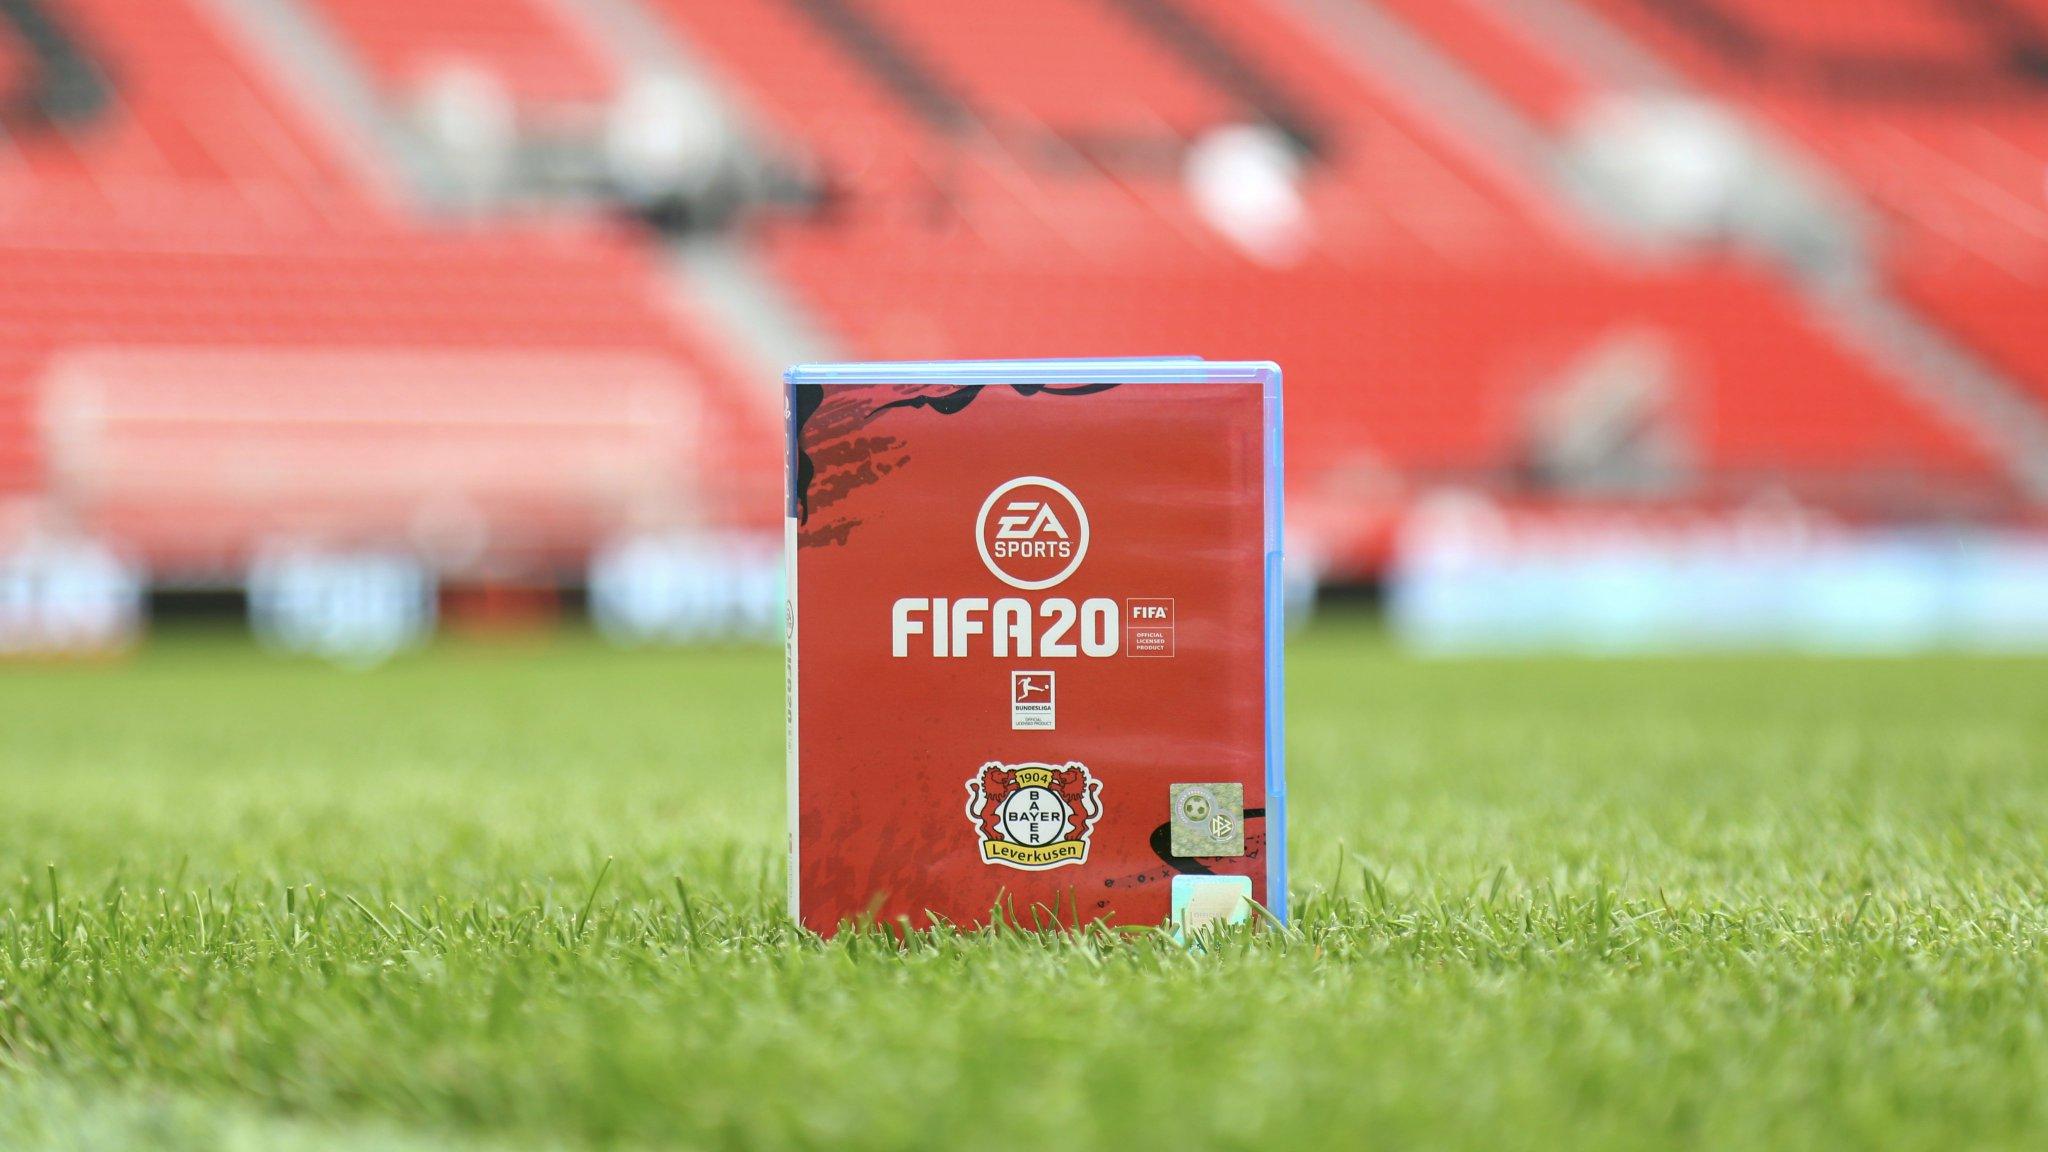 Bayer 04 Leverkusen: 🎮 Da ist das Ding! 💪 @b04esports #b04eSports #FIFA20 #Bayer04  👉 https://t.co/...